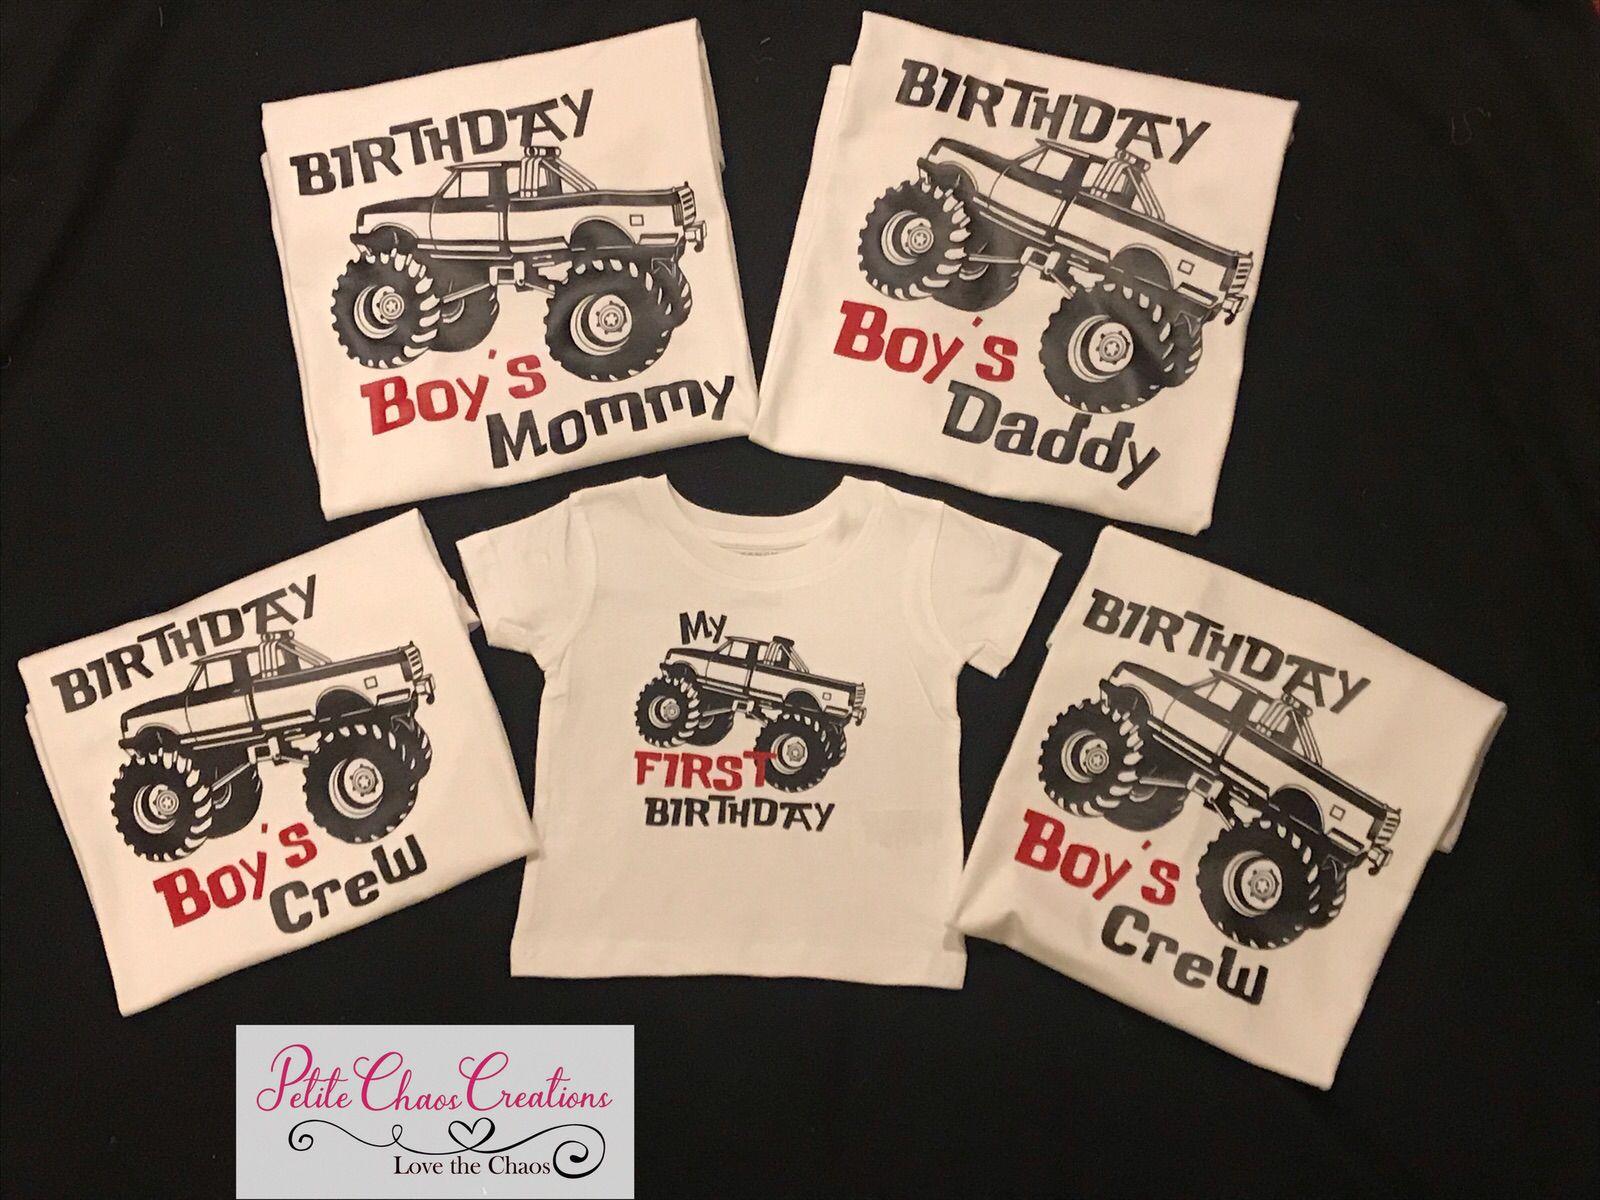 Monster Truck Family Shirts Family Birthday Shirts Monster Truck Birthday Family Birthdays